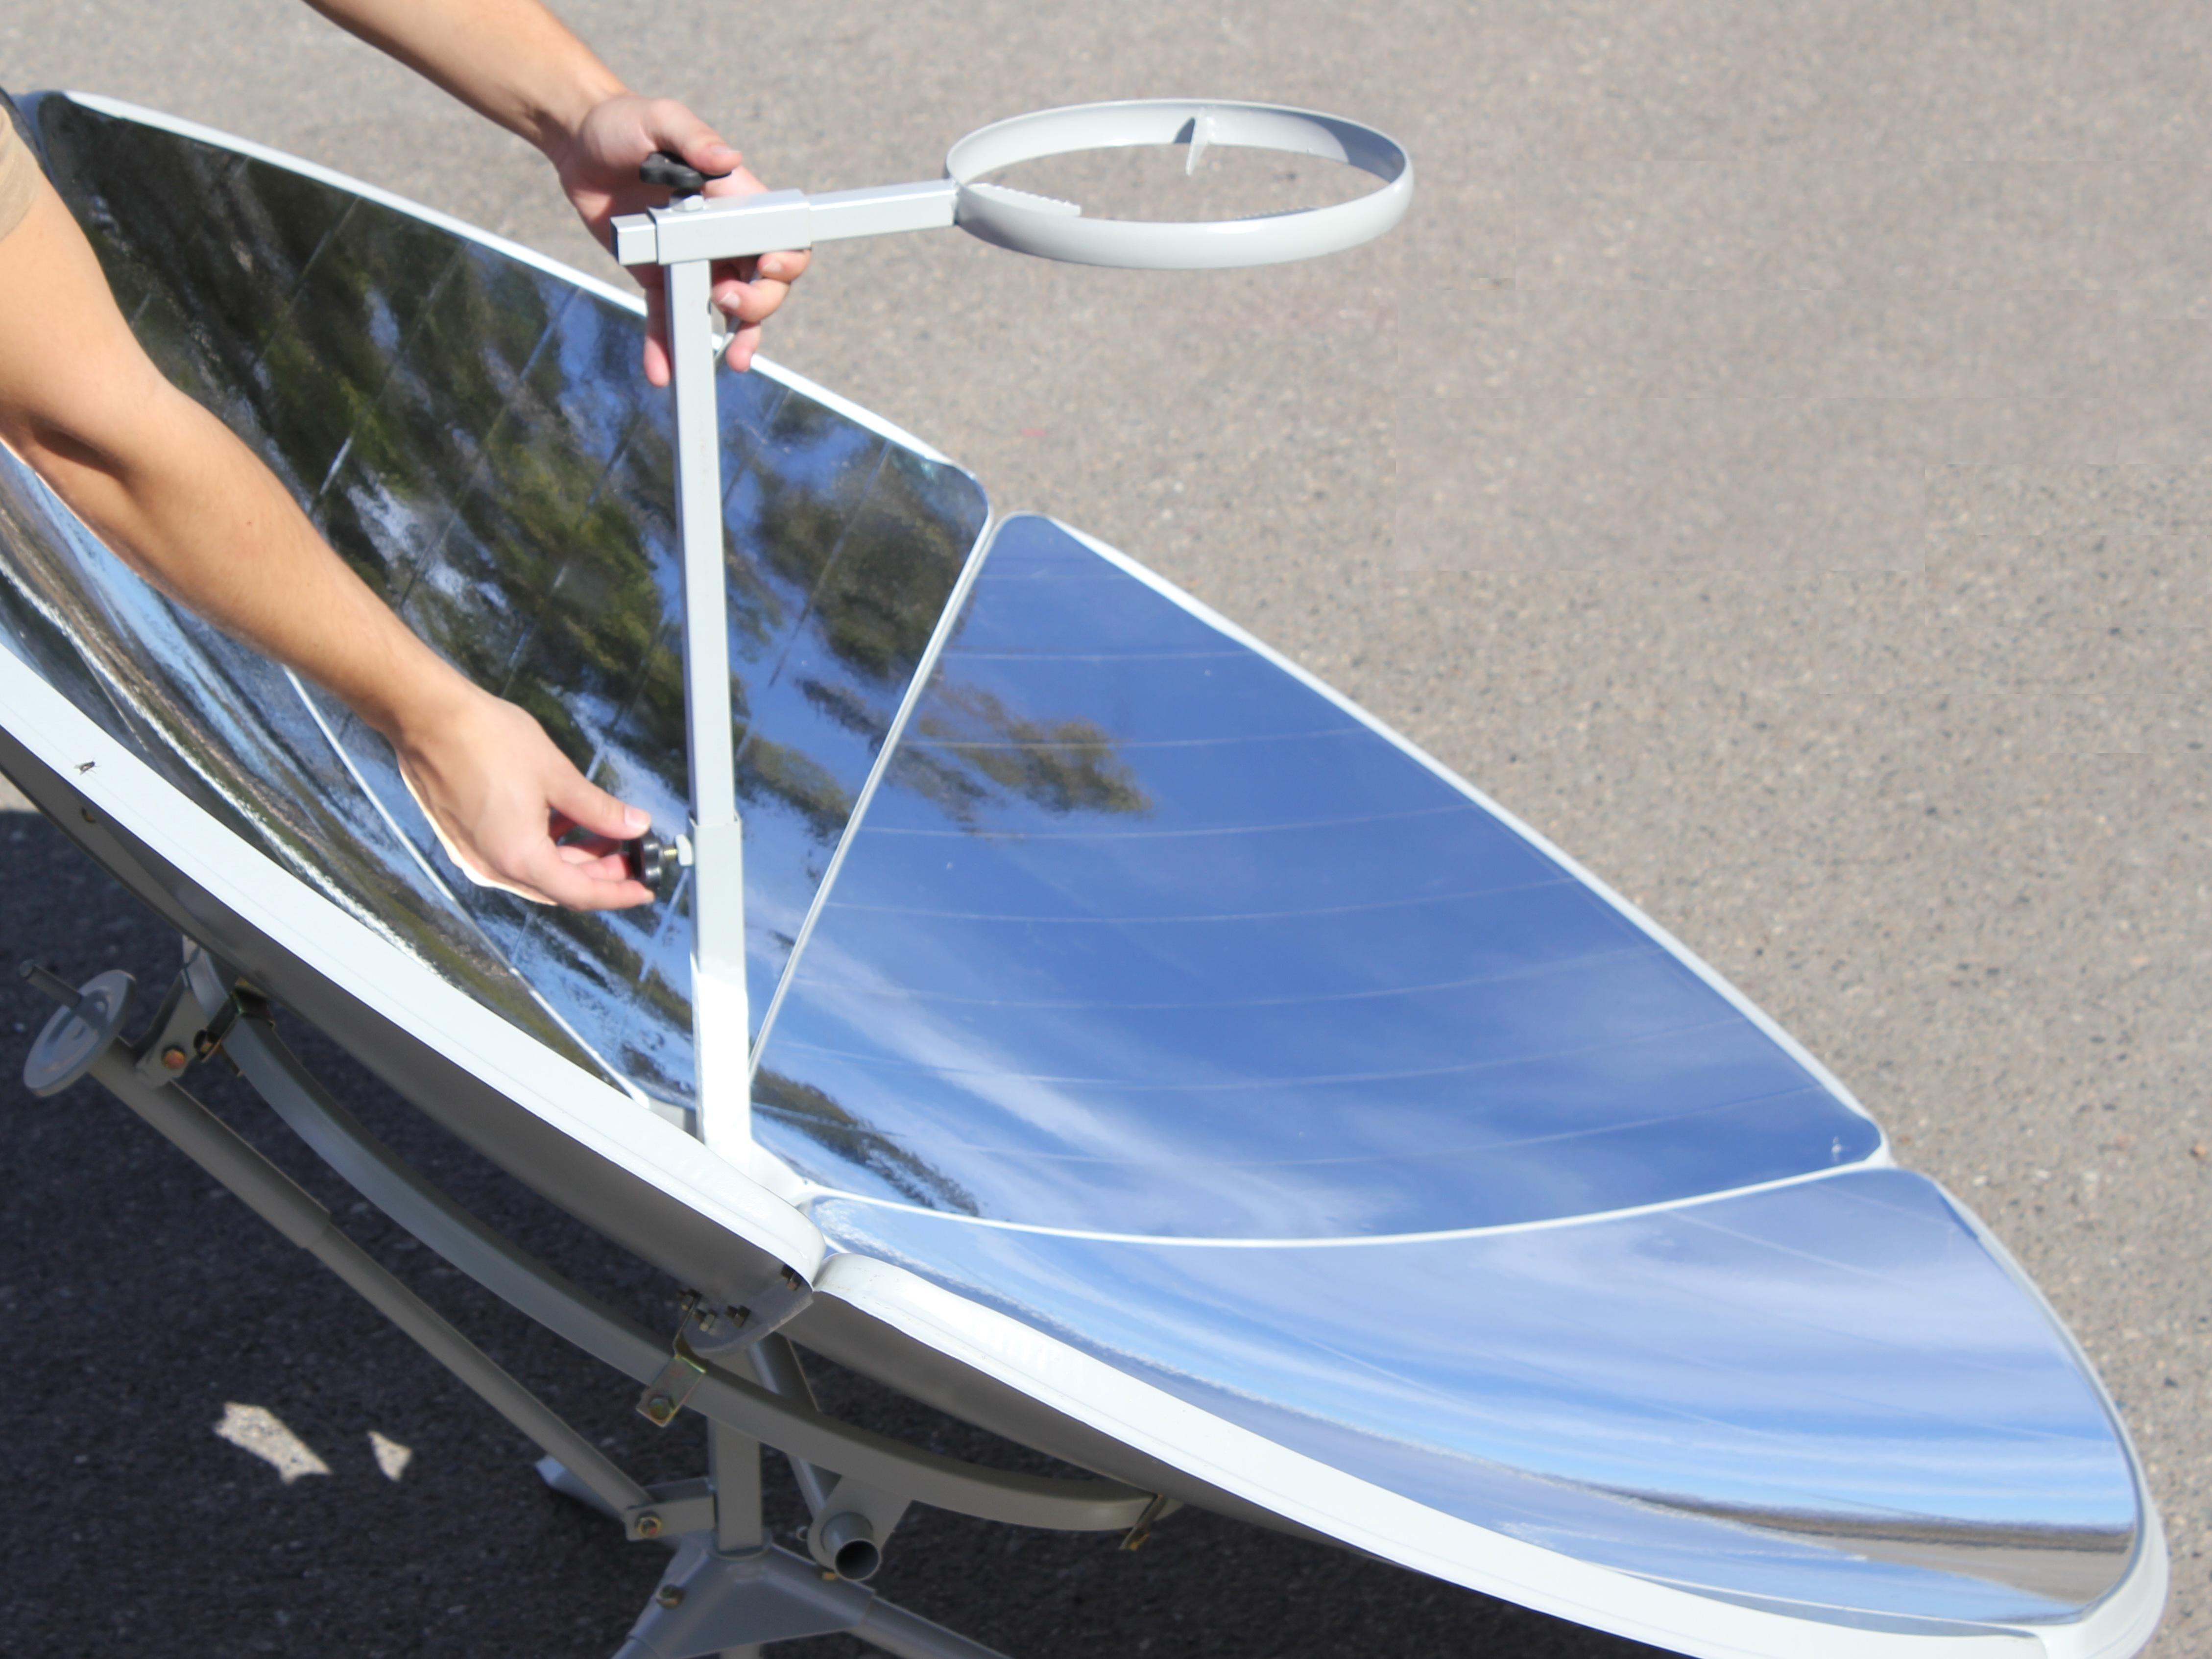 Compare Solar Cookers